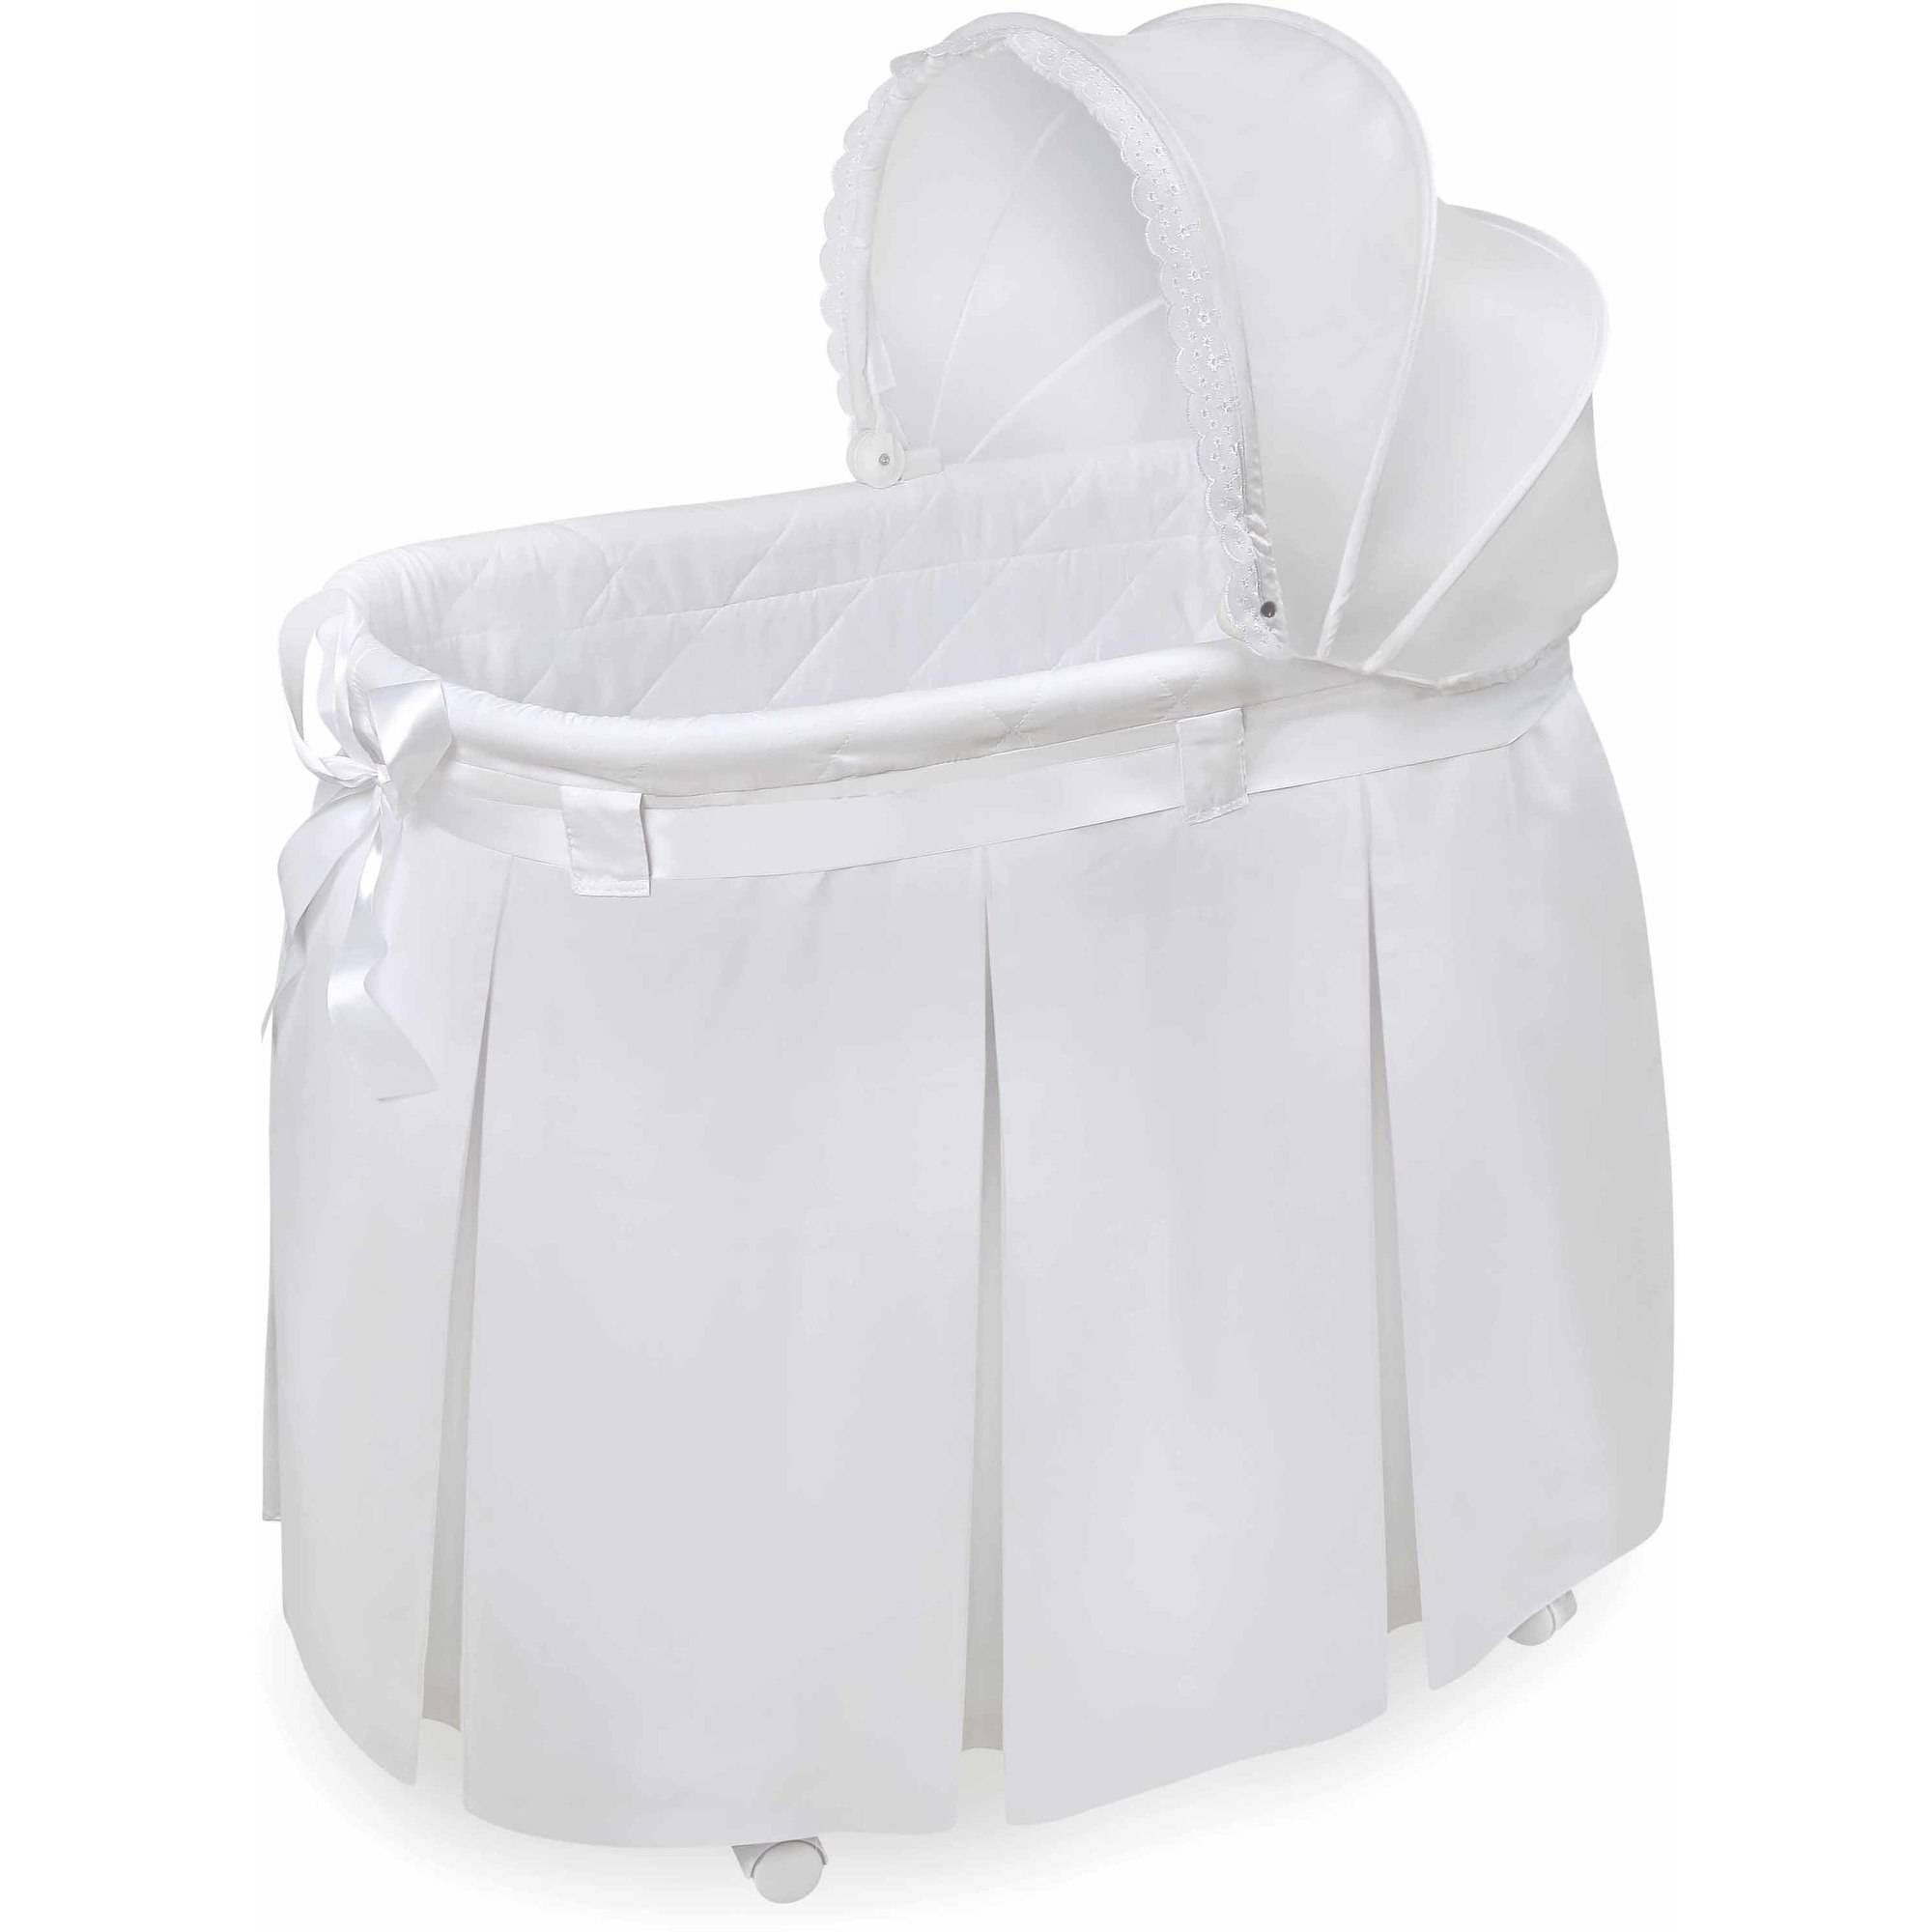 Click here to buy Badger Basket Wishes Oval Bassinet, White by Badger Basket.